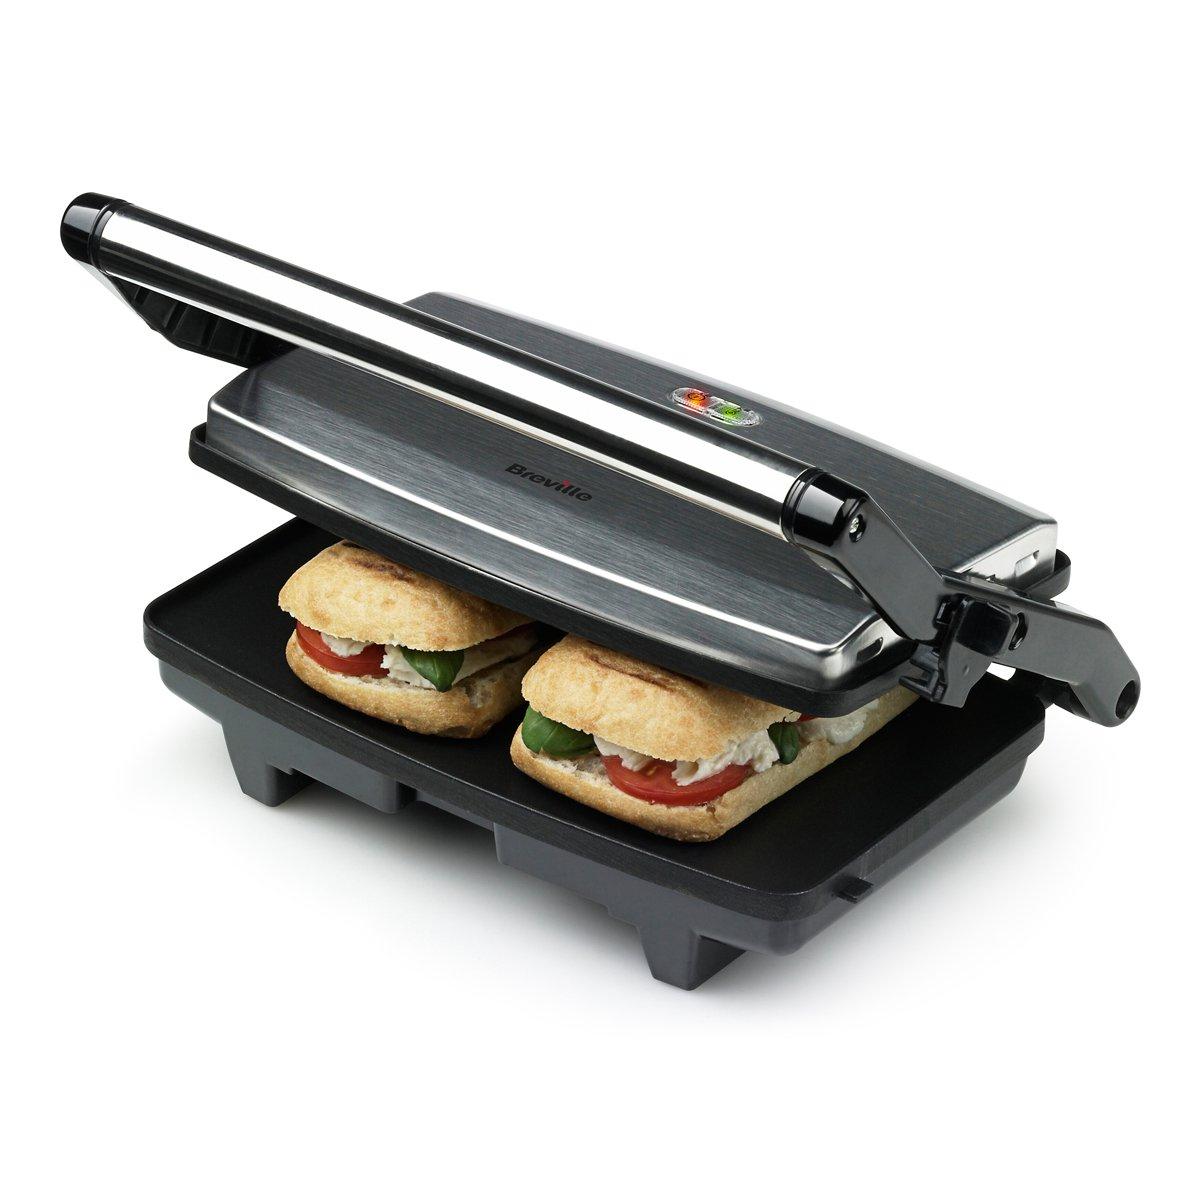 Breville VST049 2 Slice Toasted Sandwich Maker & Panini Maker - £9.00 at Morrisons